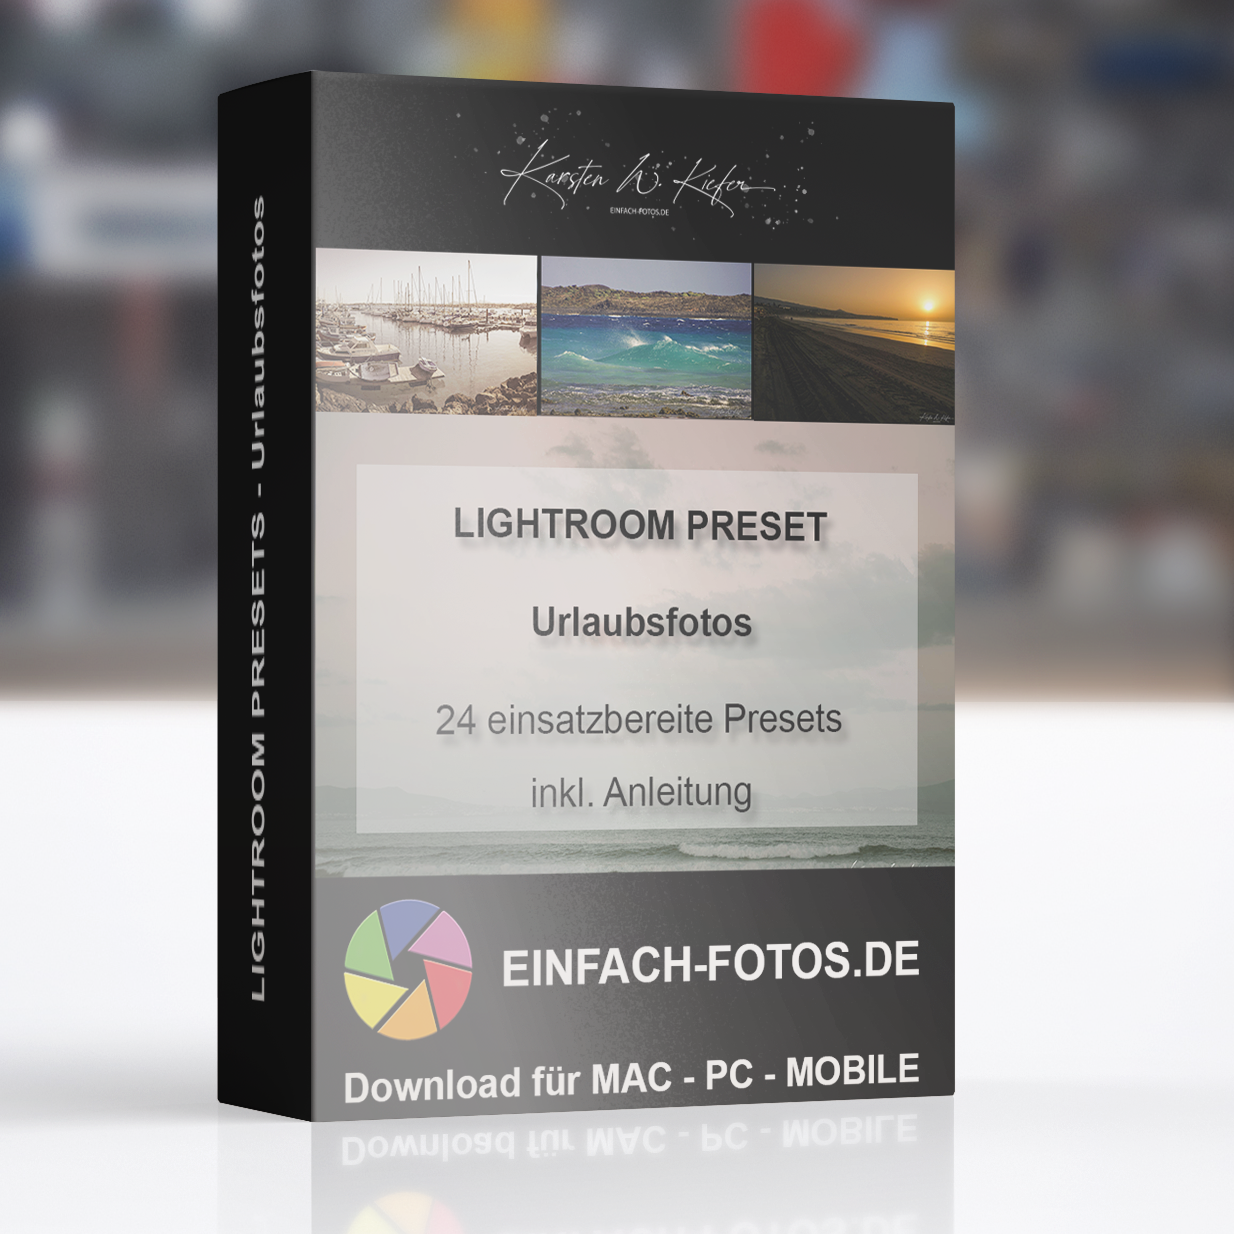 Lightroom Presets für Urlaubsfotos